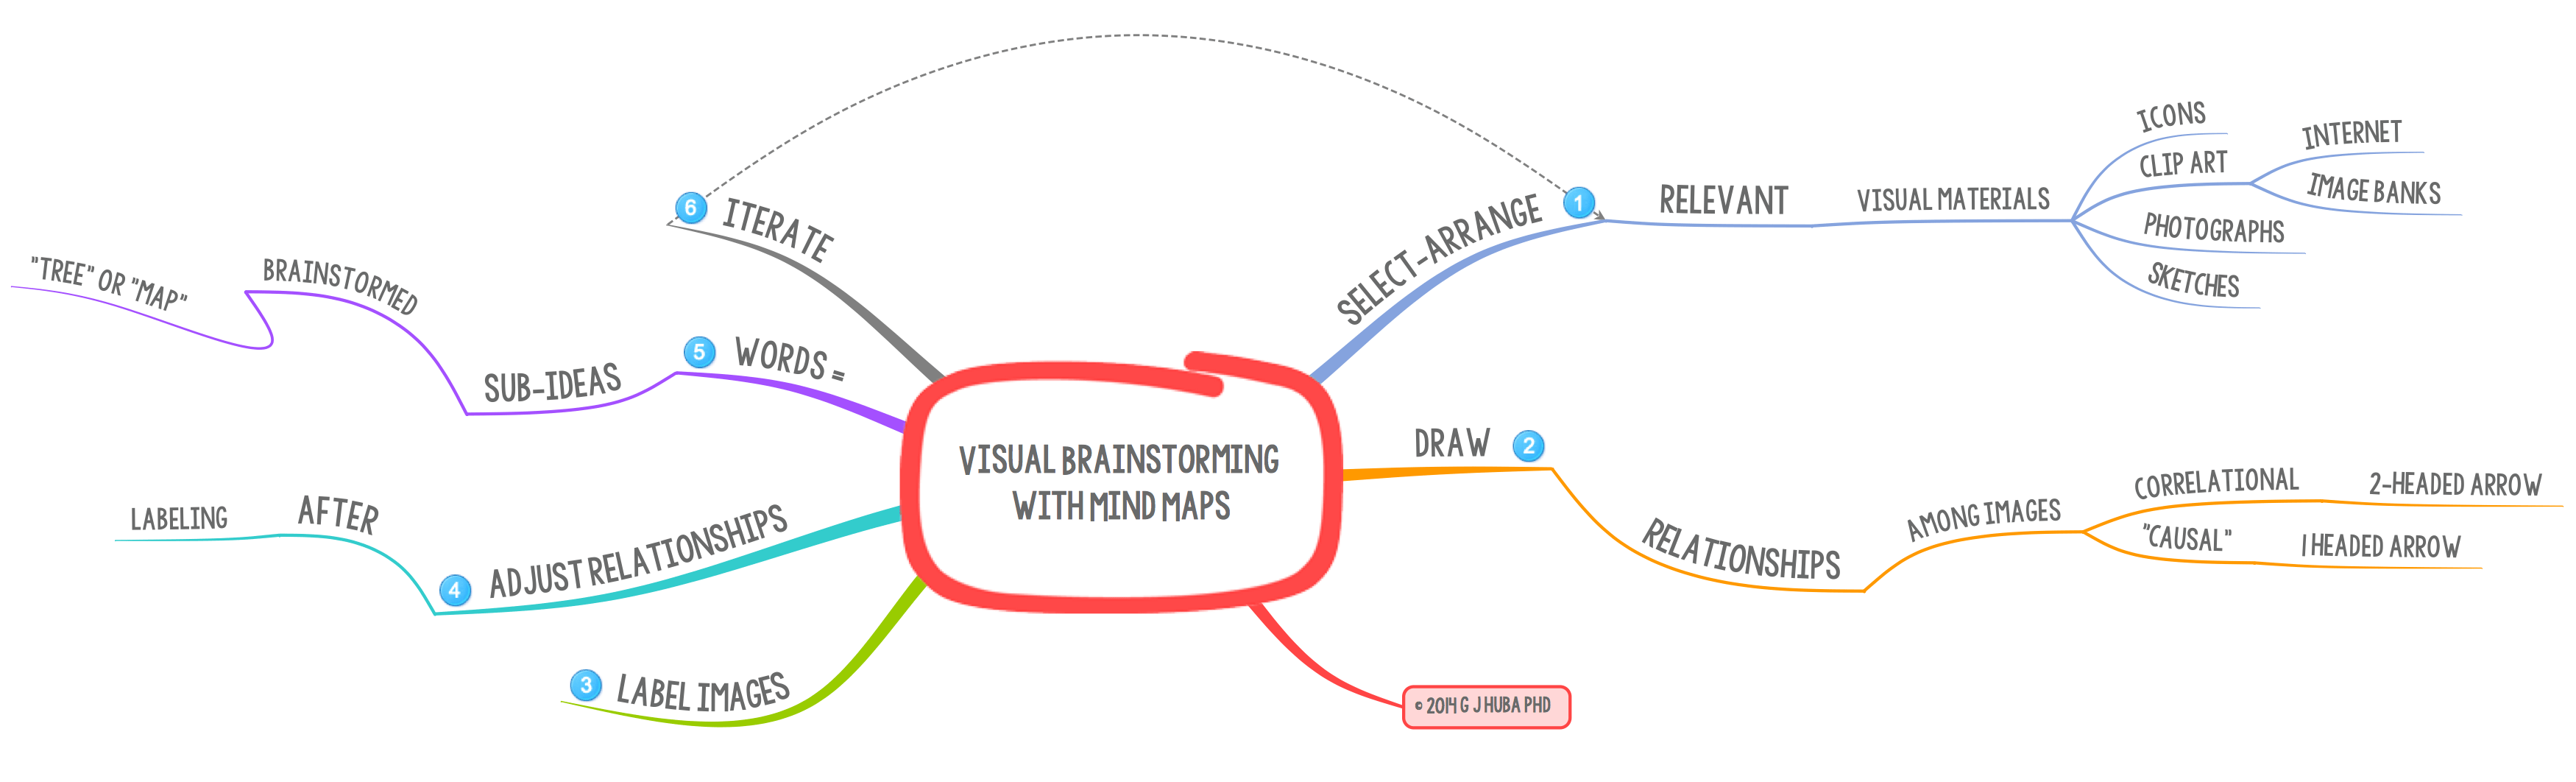 Visual Brainstorming With Mindmaps